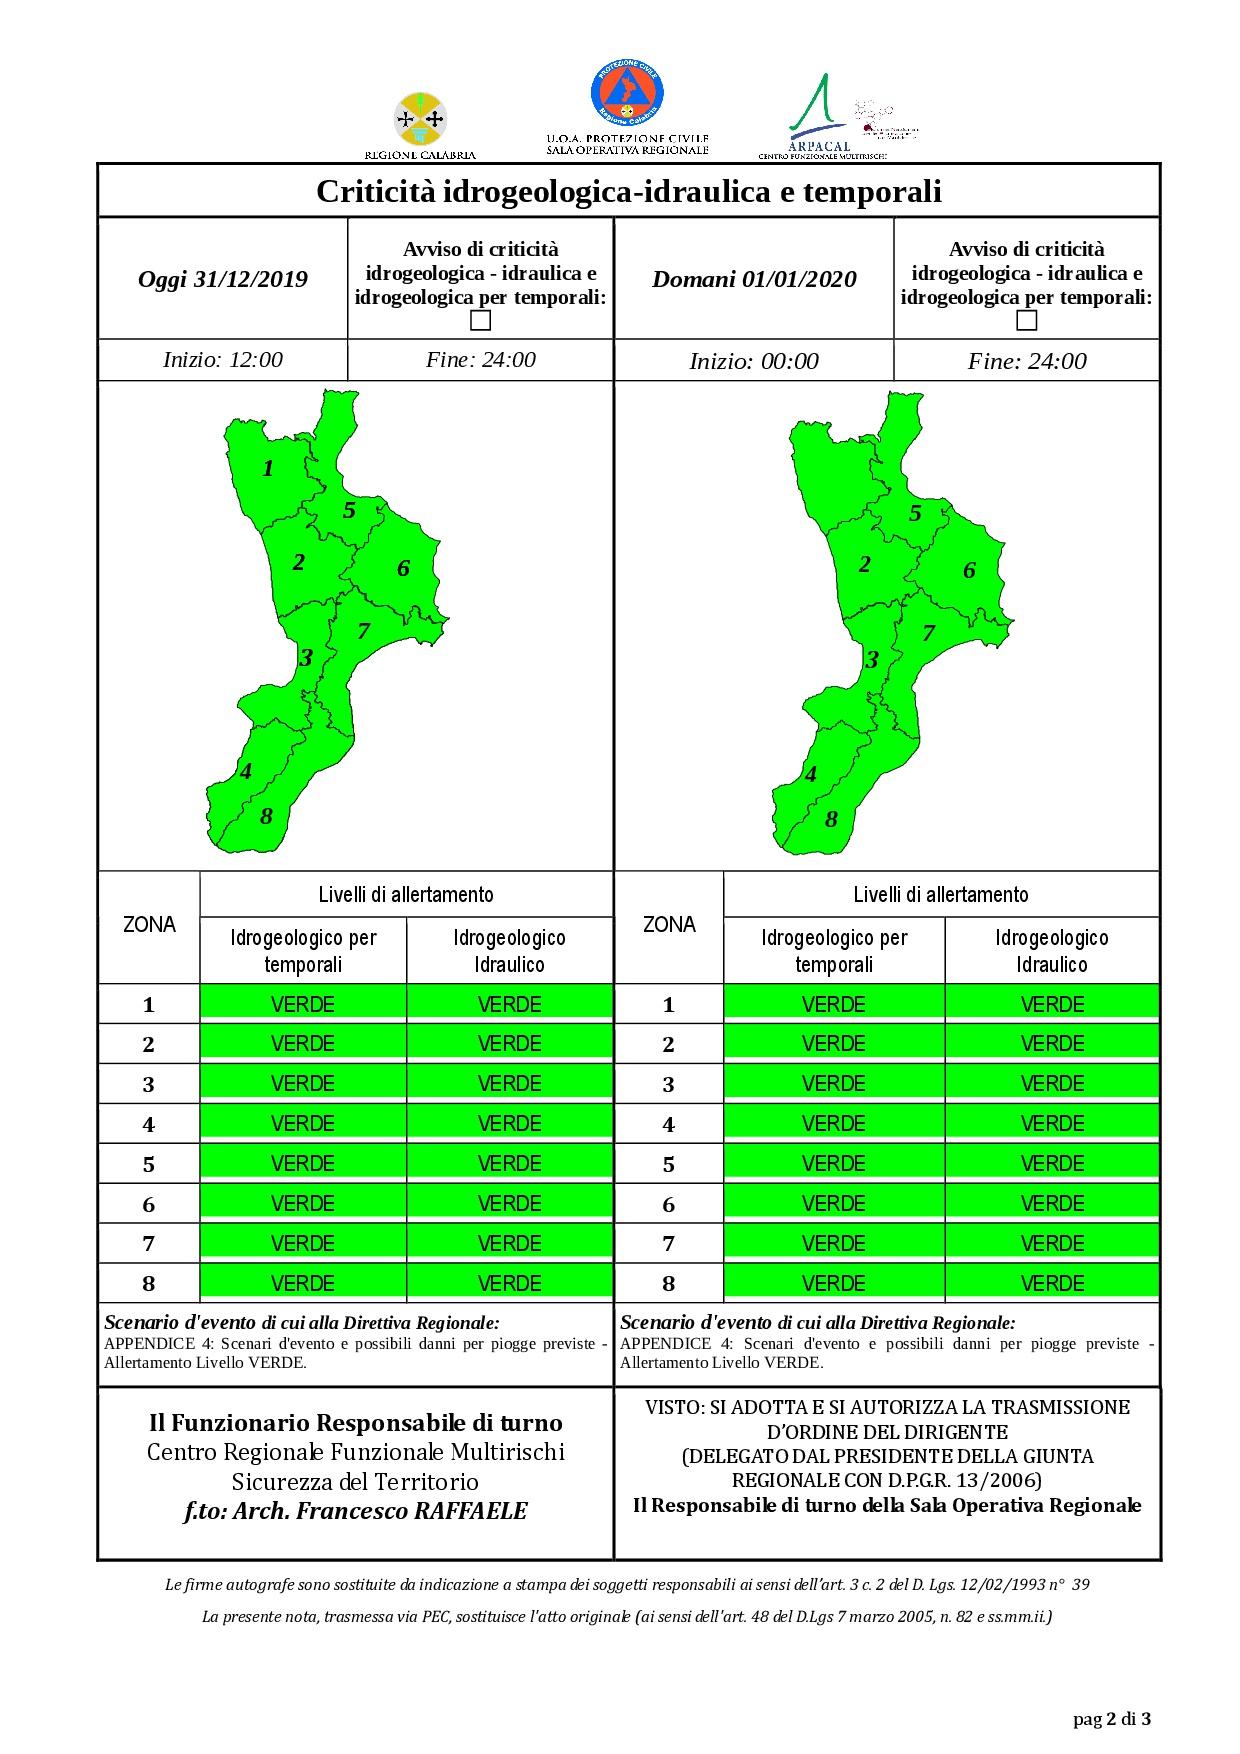 Criticità idrogeologica-idraulica e temporali in Calabria 31-12-2019